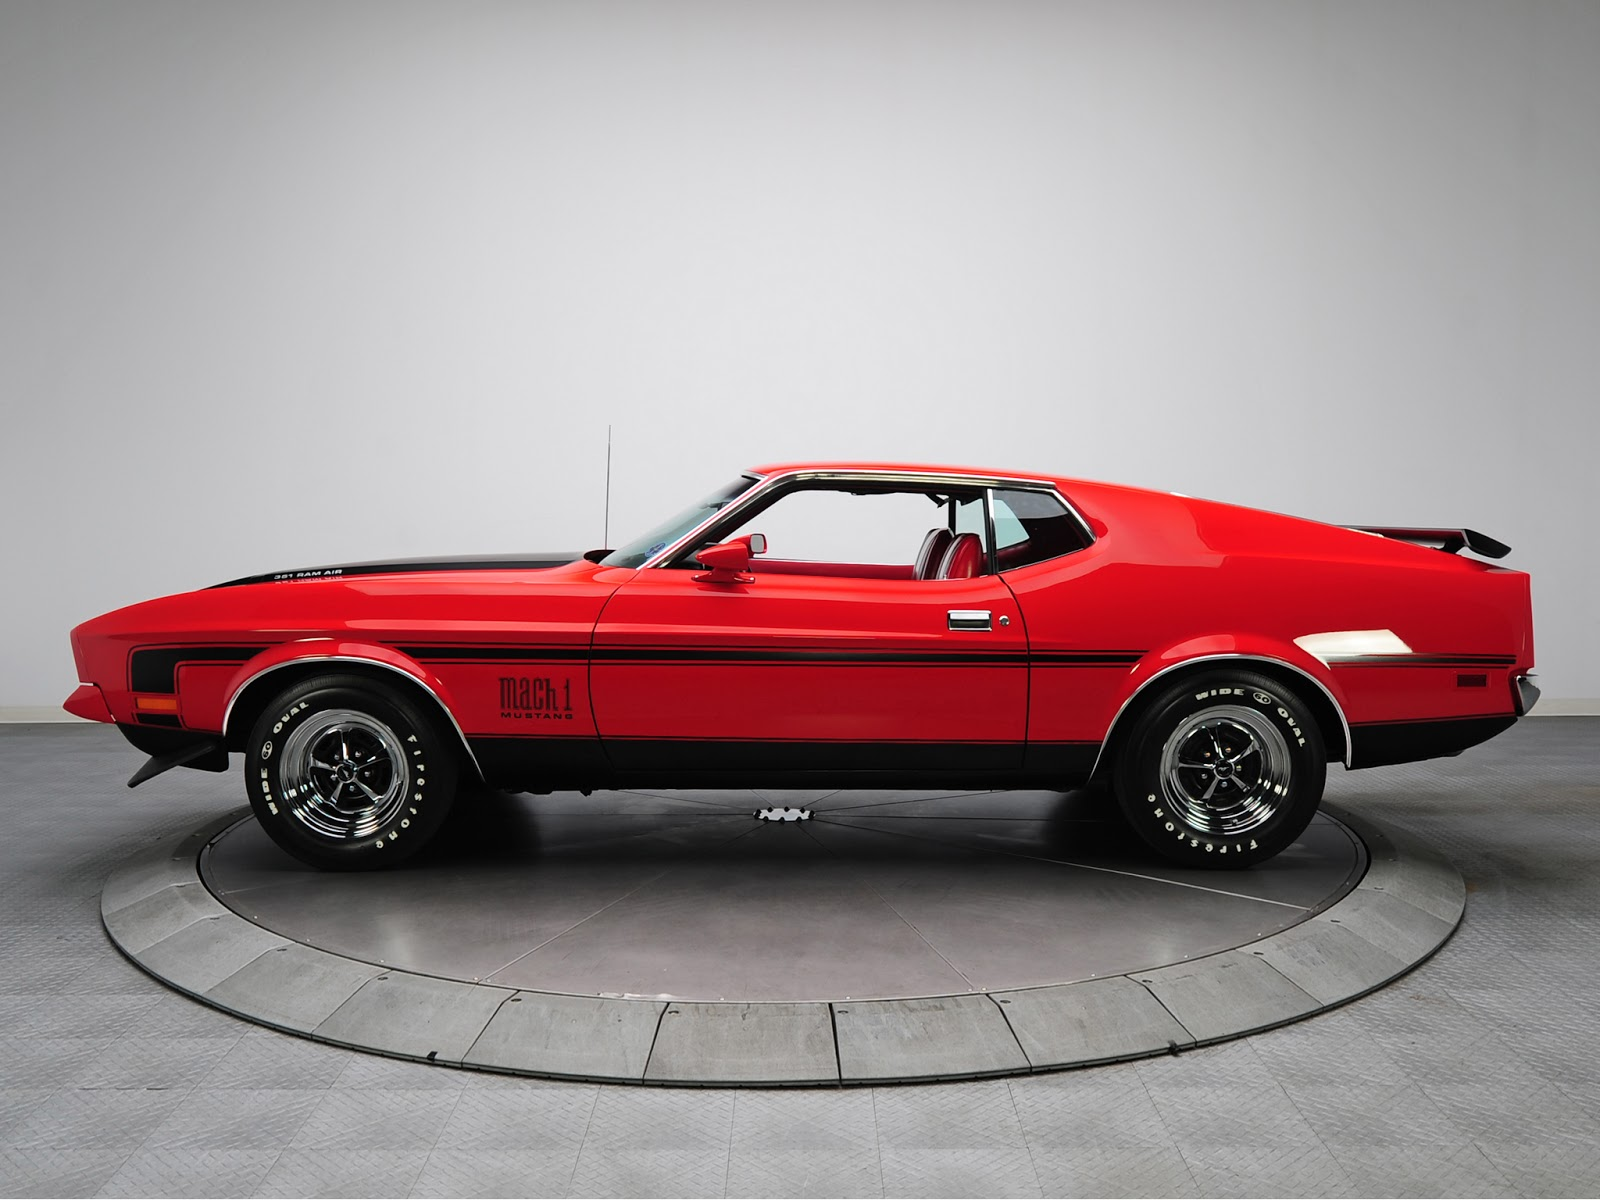 Mustang 2013 Front Bumper >> FAB WHEELS DIGEST (F.W.D.): Ford Mustang Mach 1 - 2nd Gen. (1971-73)